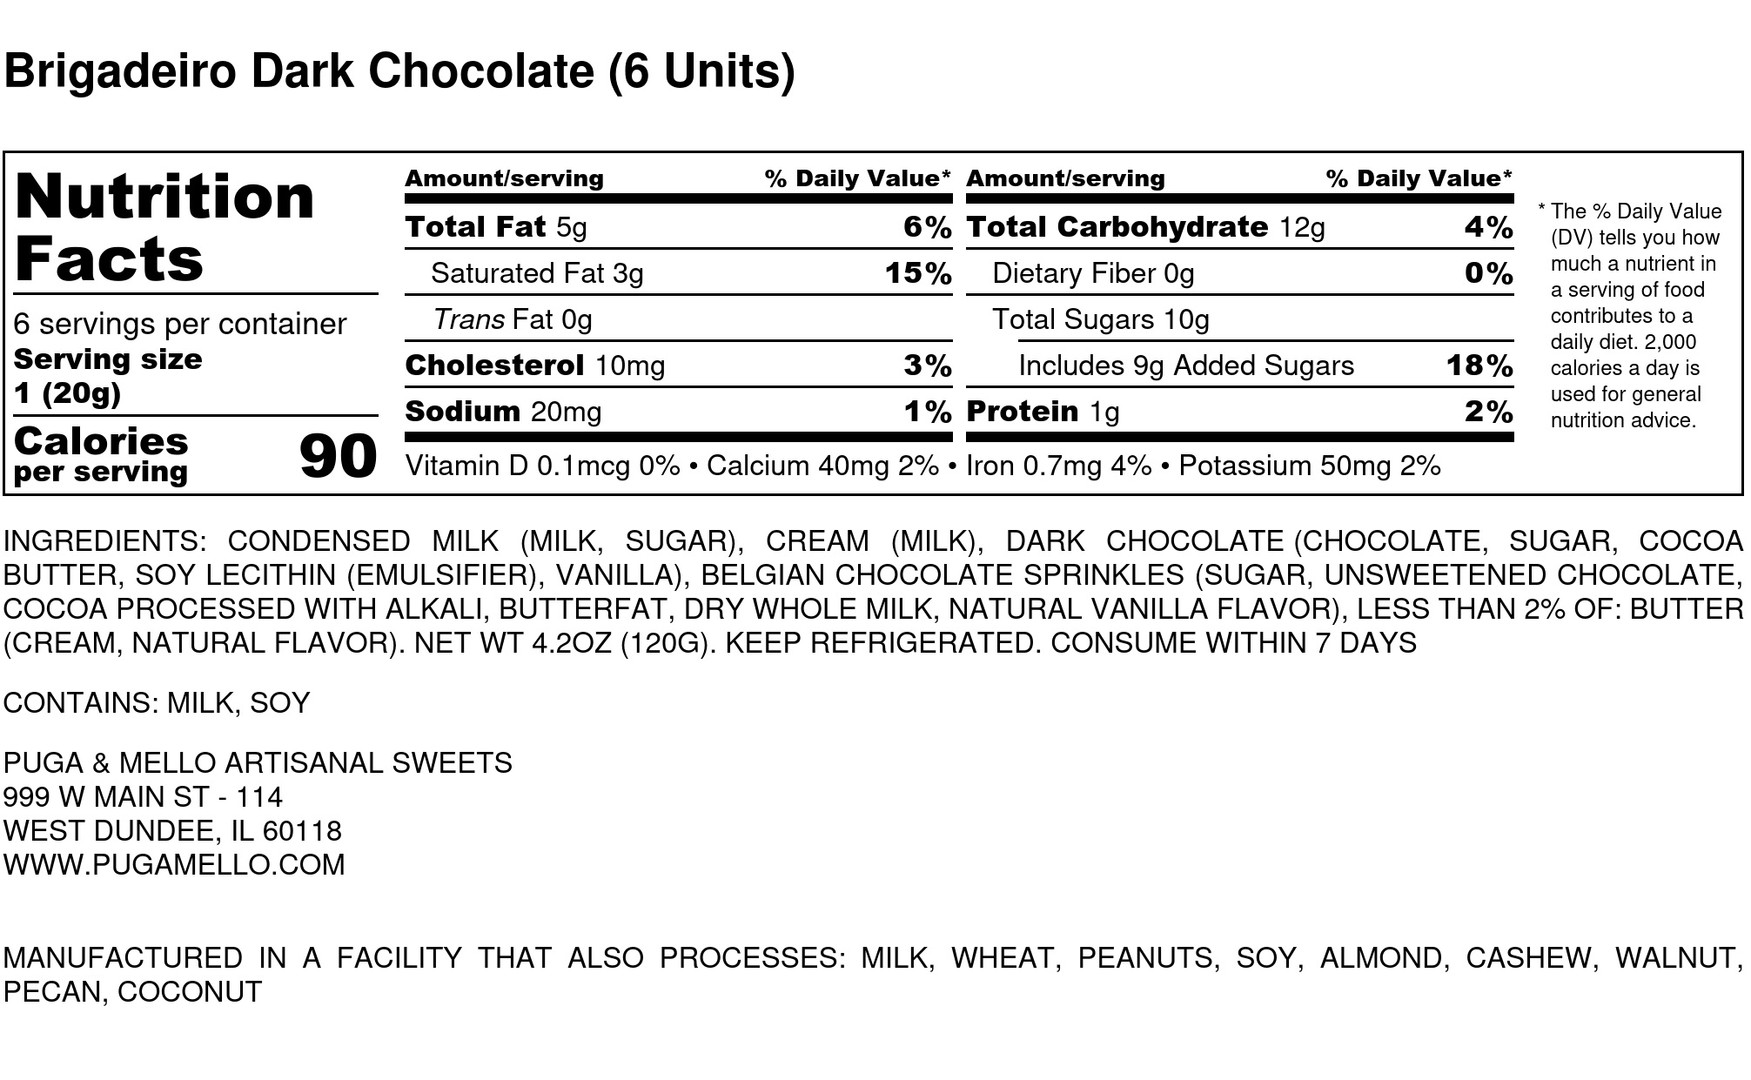 Brigadeiro Dark Chocolate (6 Units) - Nu